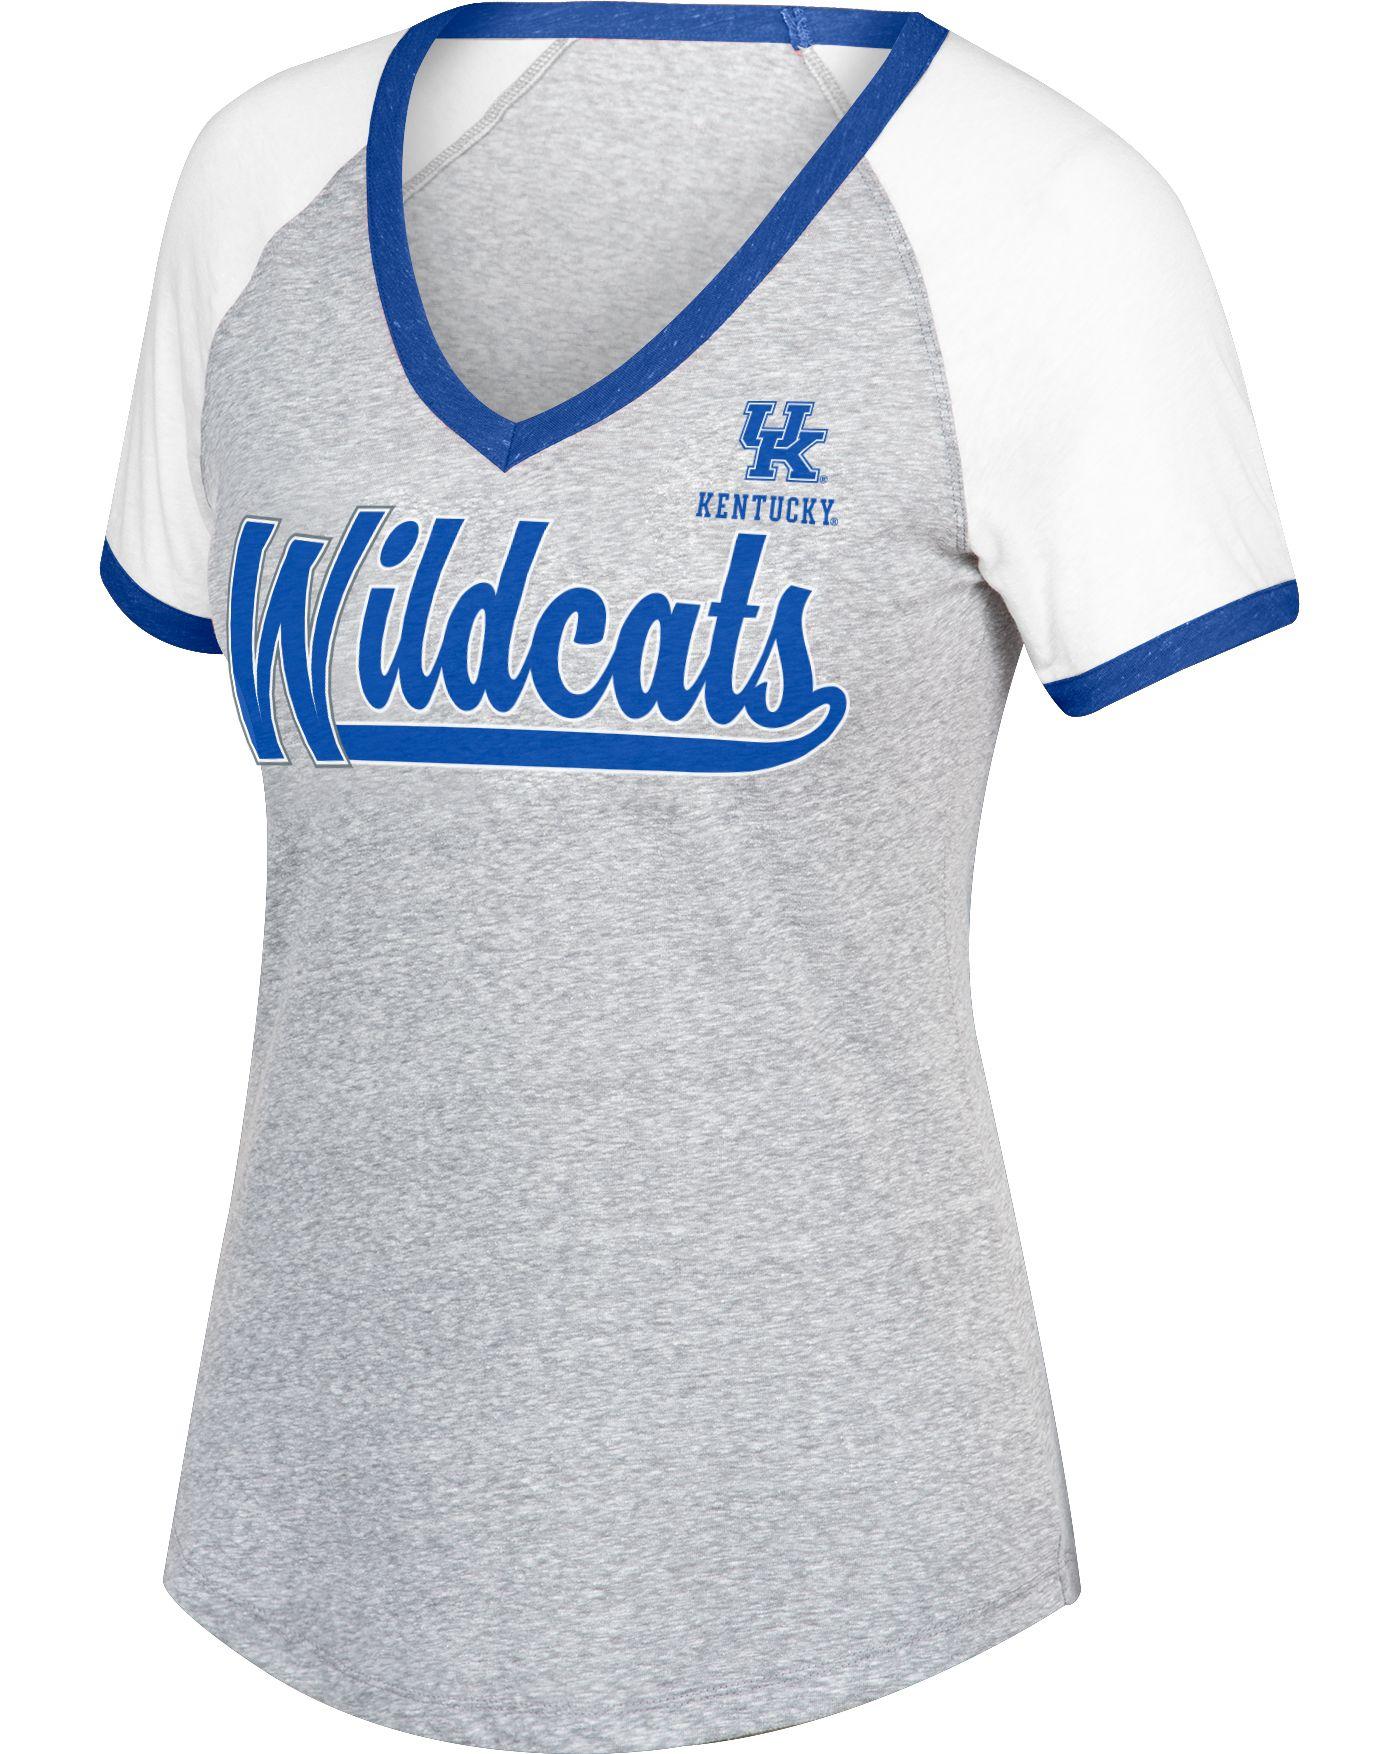 Top of the World Women's Kentucky Wildcats Gray Happy Heart T-Shirt